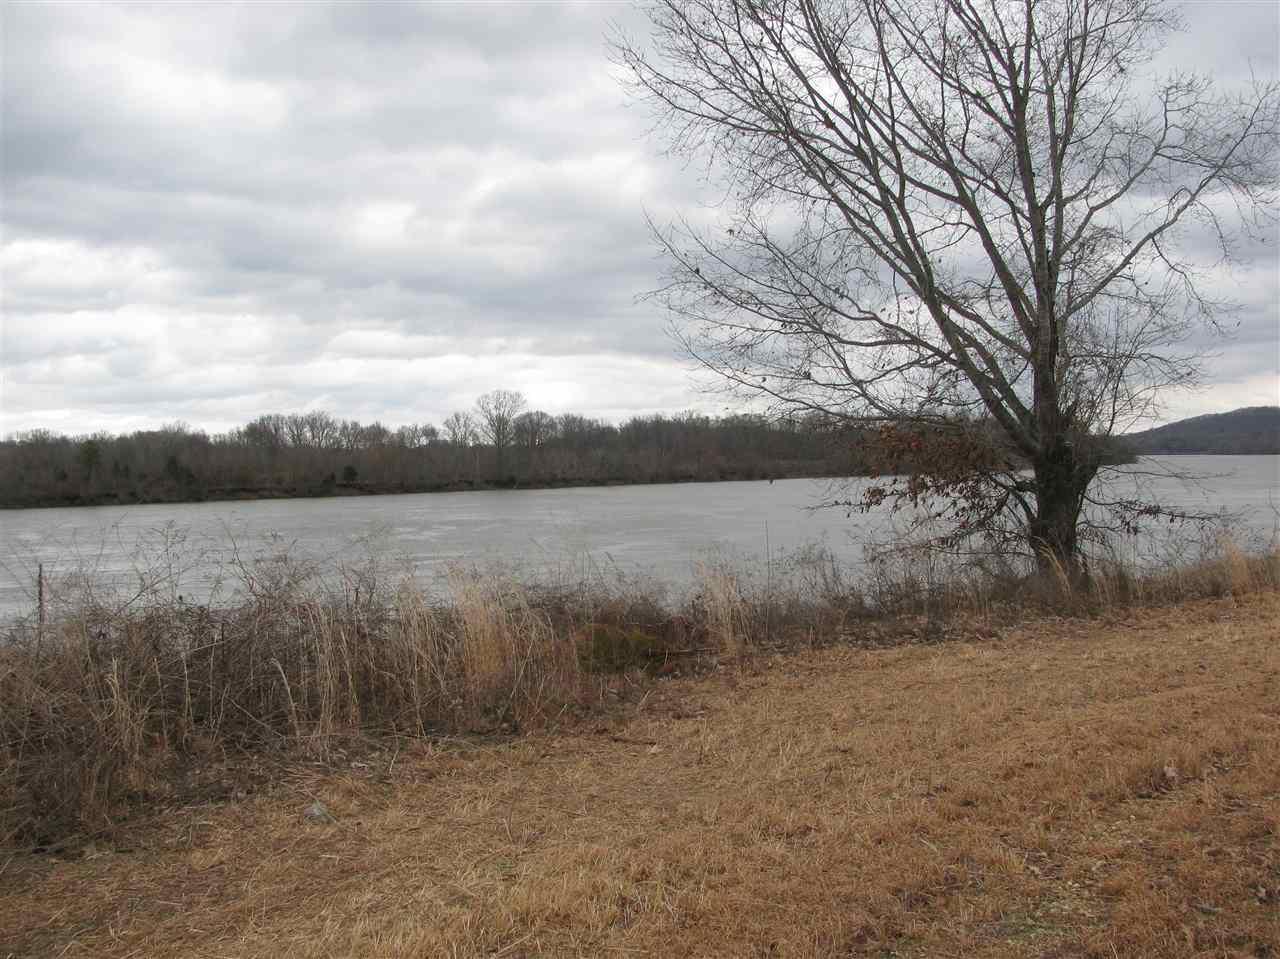 2 Water Clifton, TN 38425 - MLS #: 10021174